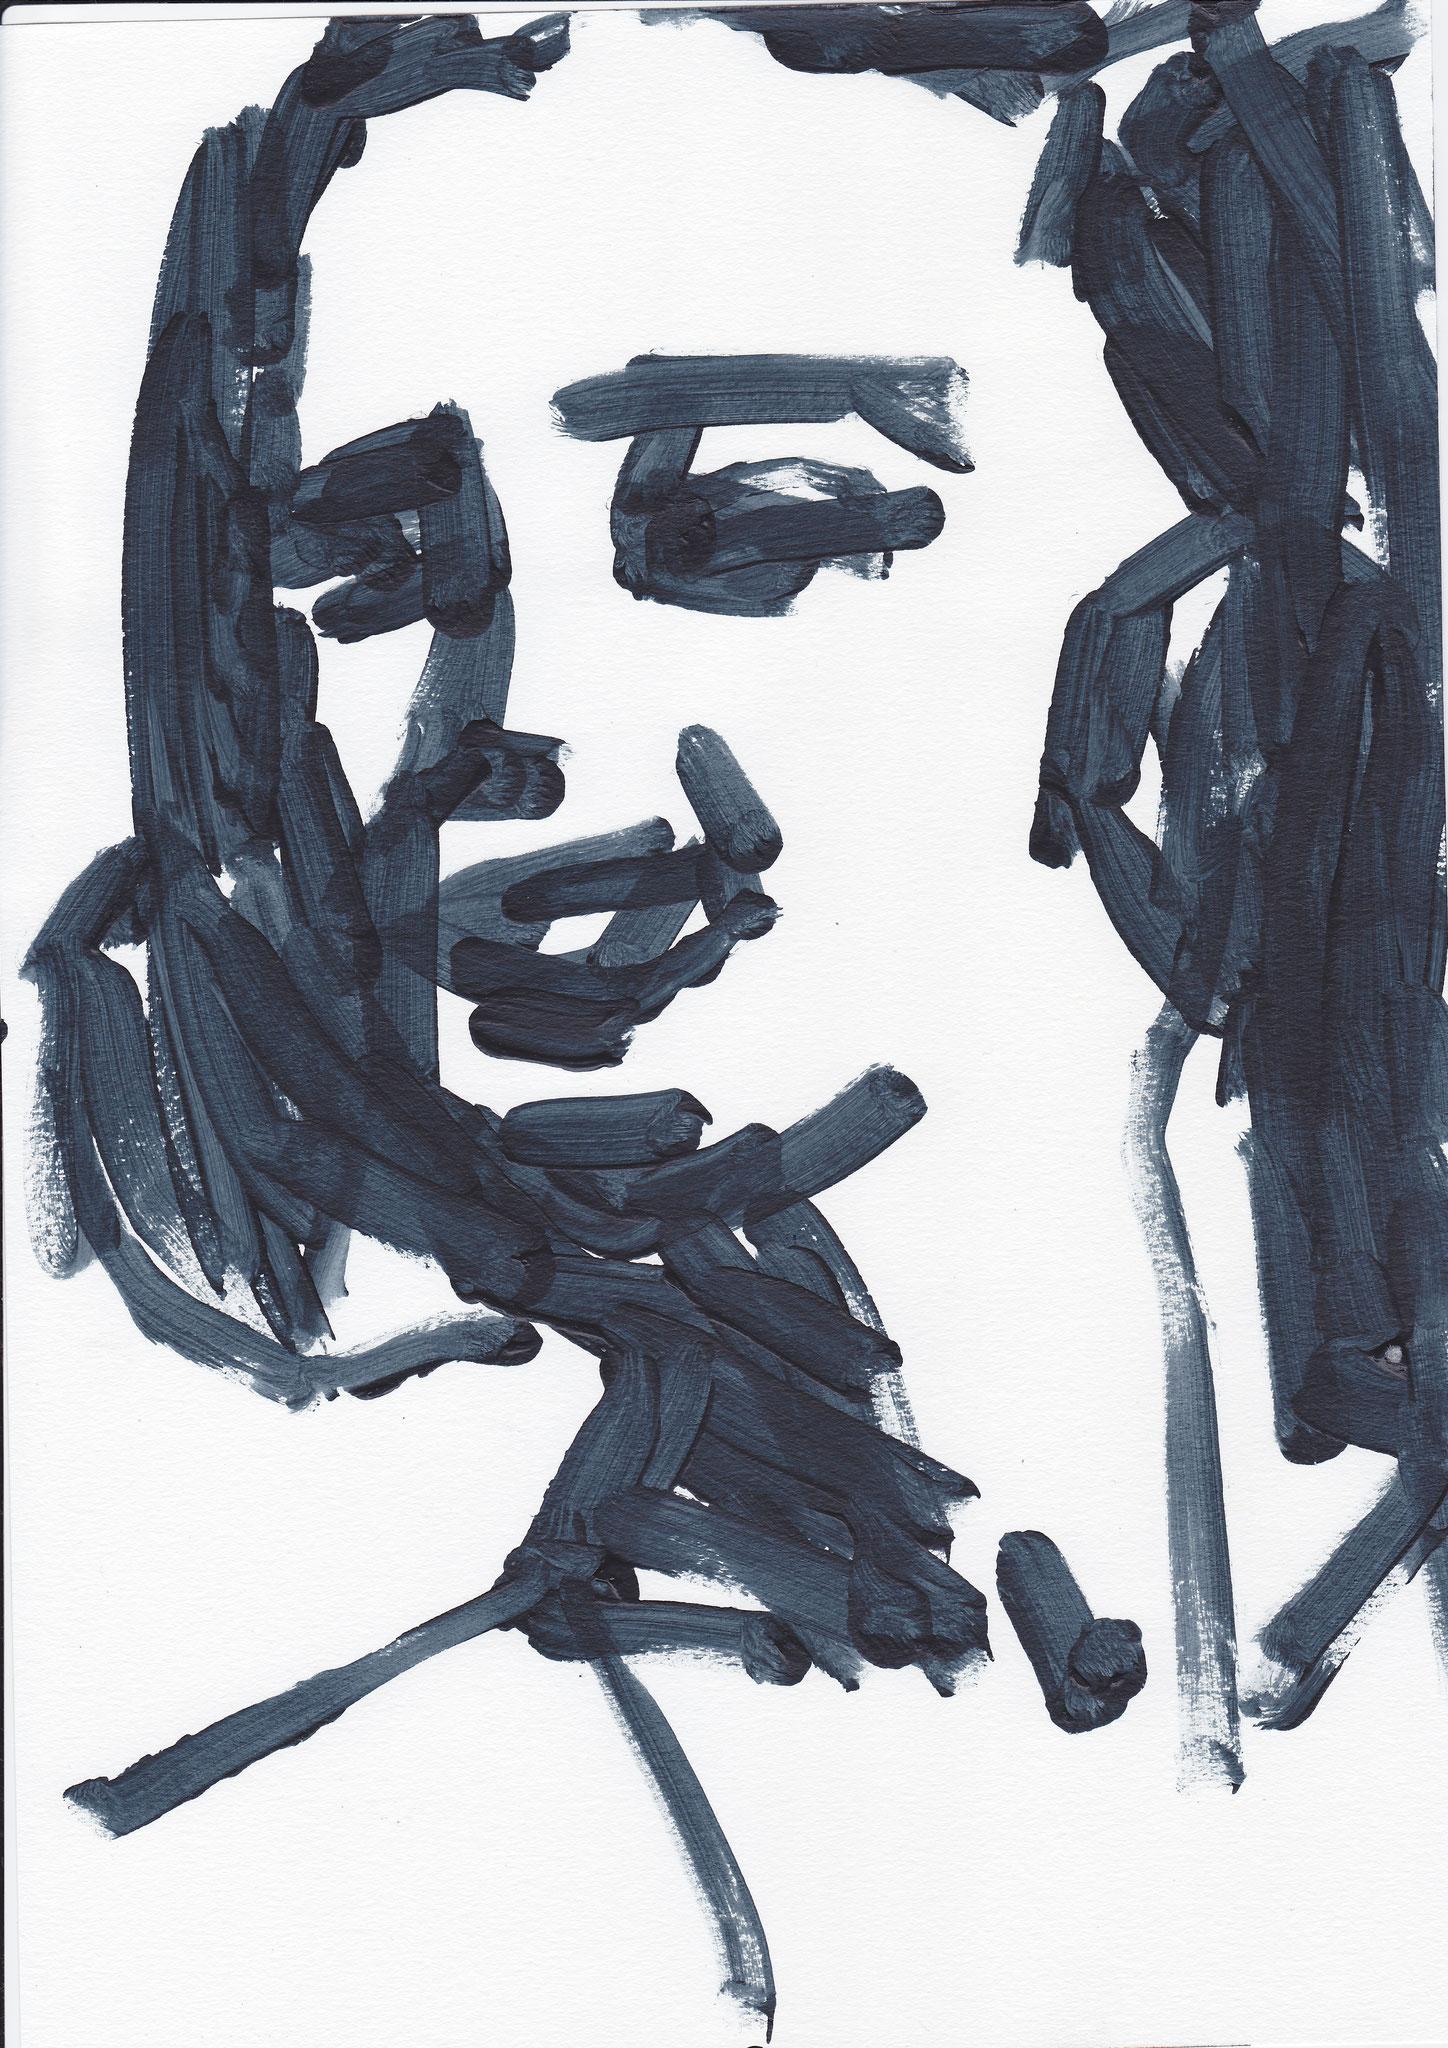 006 , acrylic on paper , 29.7 x 21cm , Selina Saranova